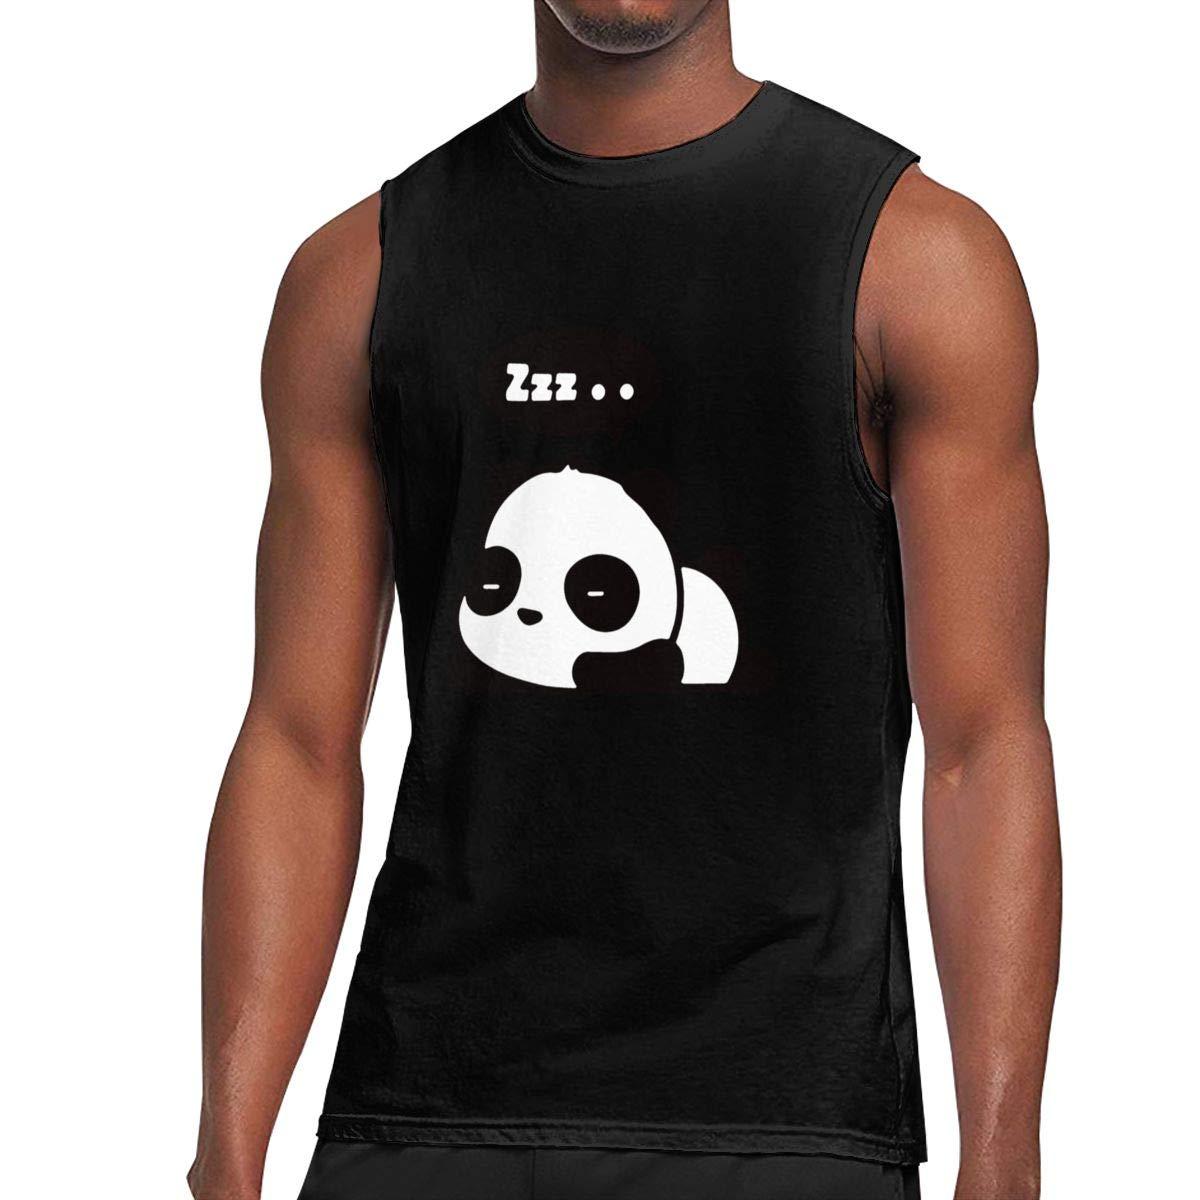 Seuriamin Sleeping Panda Cute Classic Athletic Sleeveless Muscle Short Sleeve T Shirt